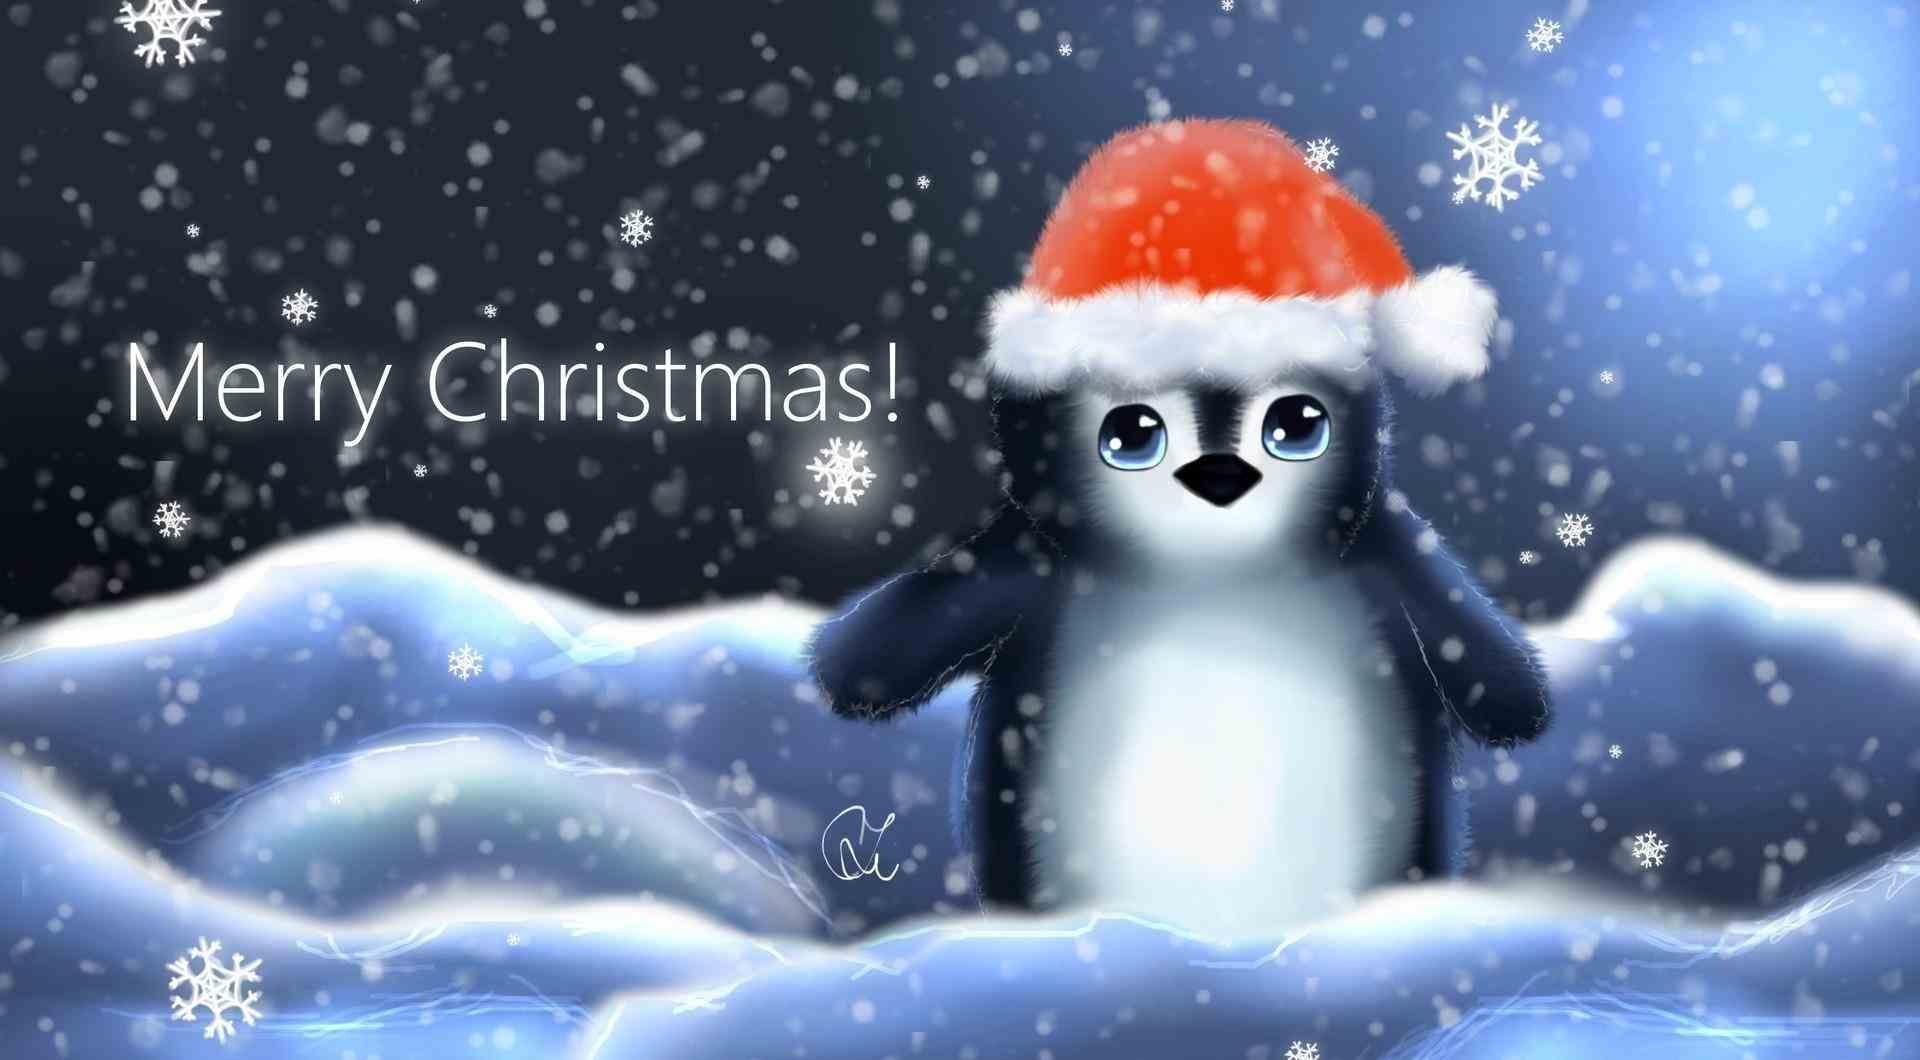 Penguins Merry Christmas Wallpaper Cute Christmas Backgrounds Animated Christmas Wallpaper